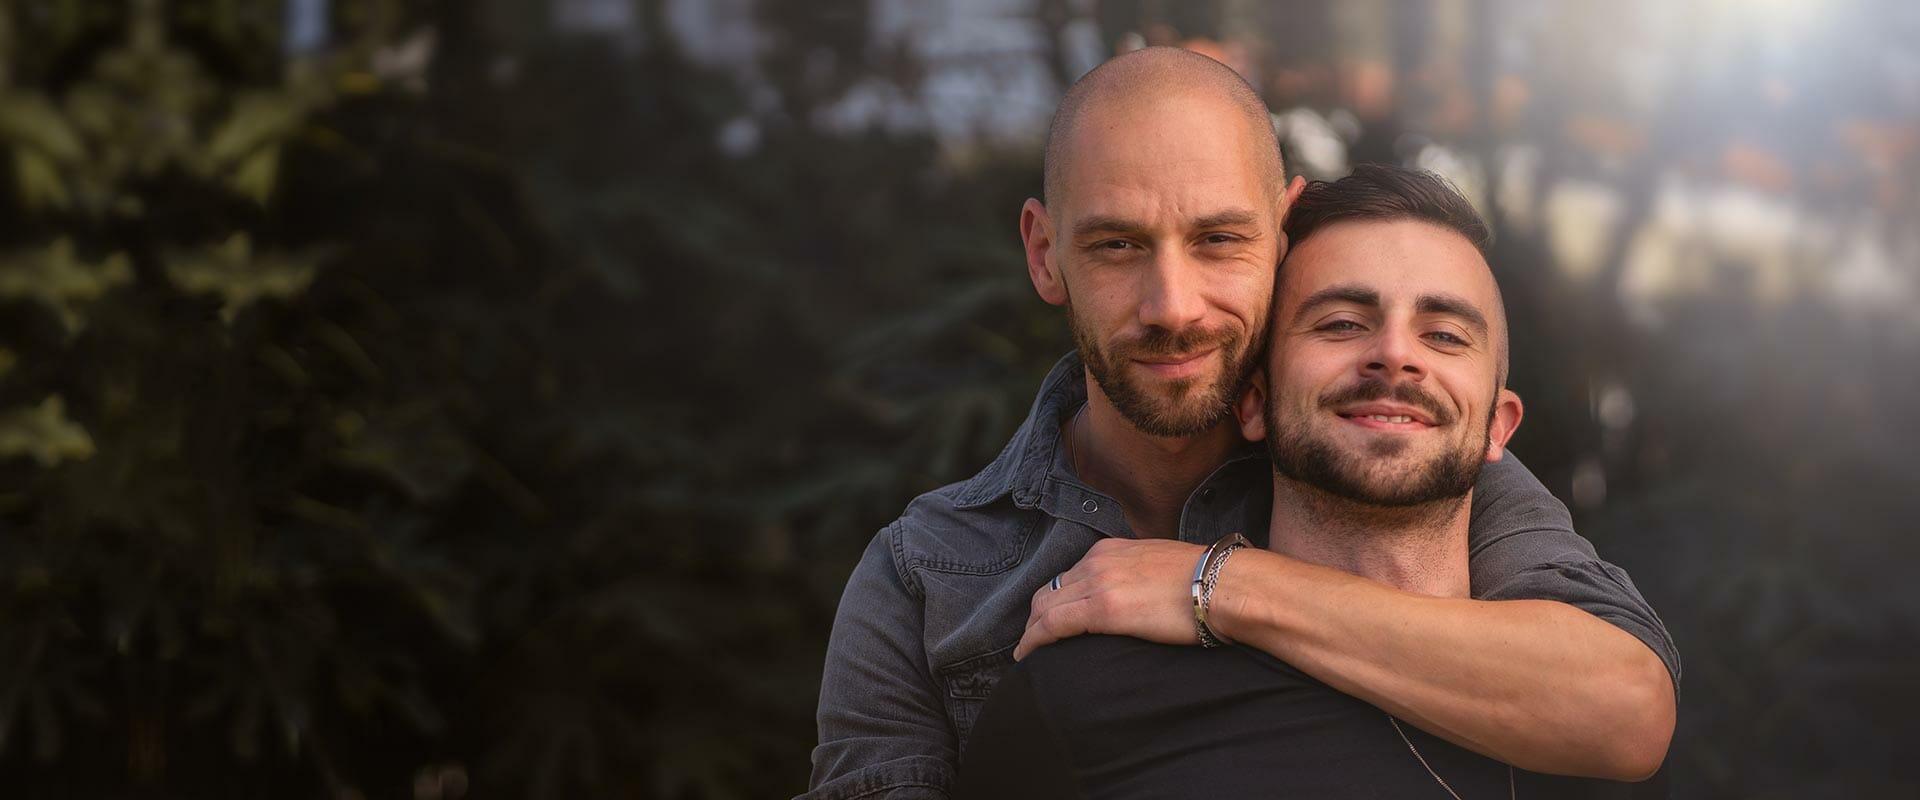 International Gay Dating Sites